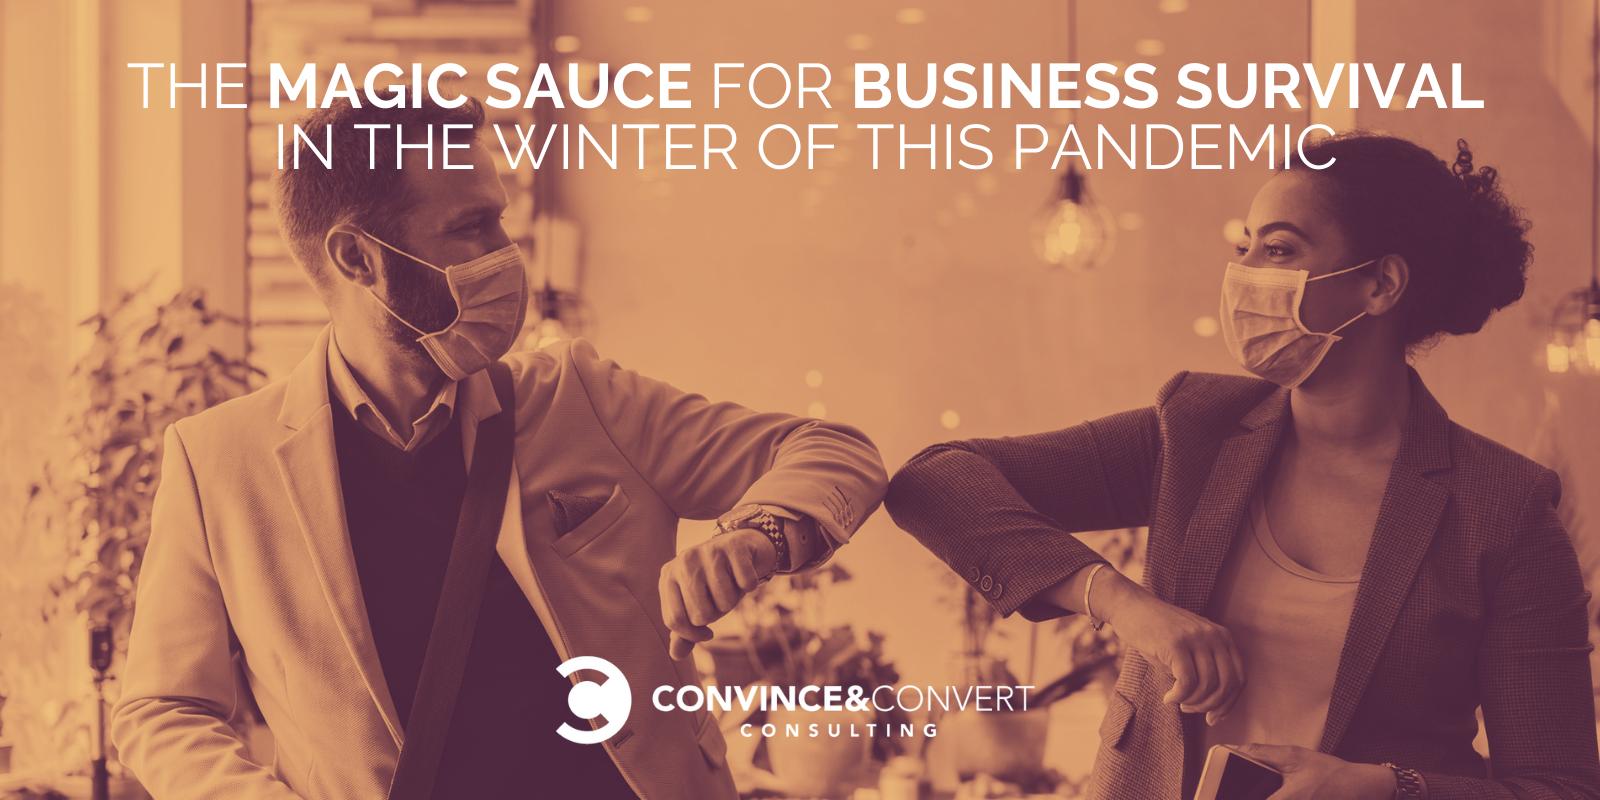 Business Survival Pandemic